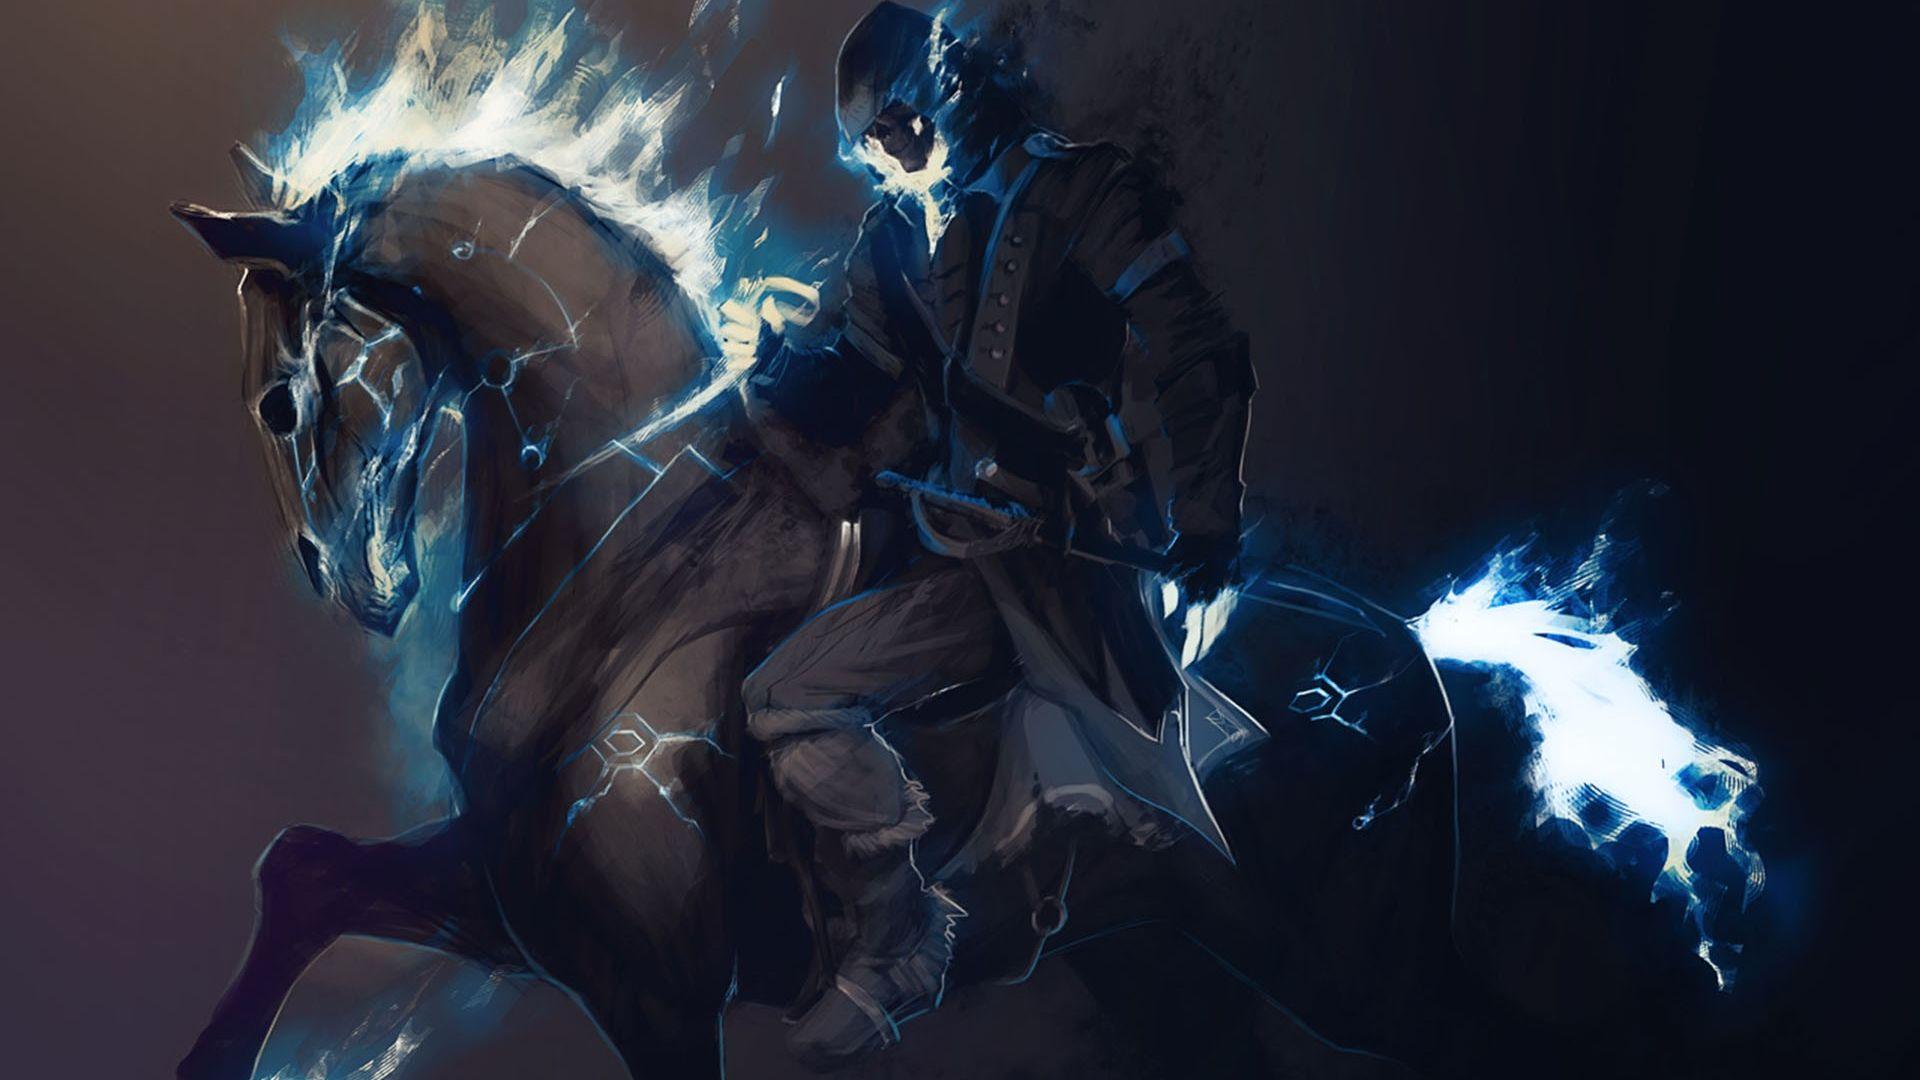 Swords and Sorcery Horseback Riding HD Wallpaper FullHDWpp 1920x1080